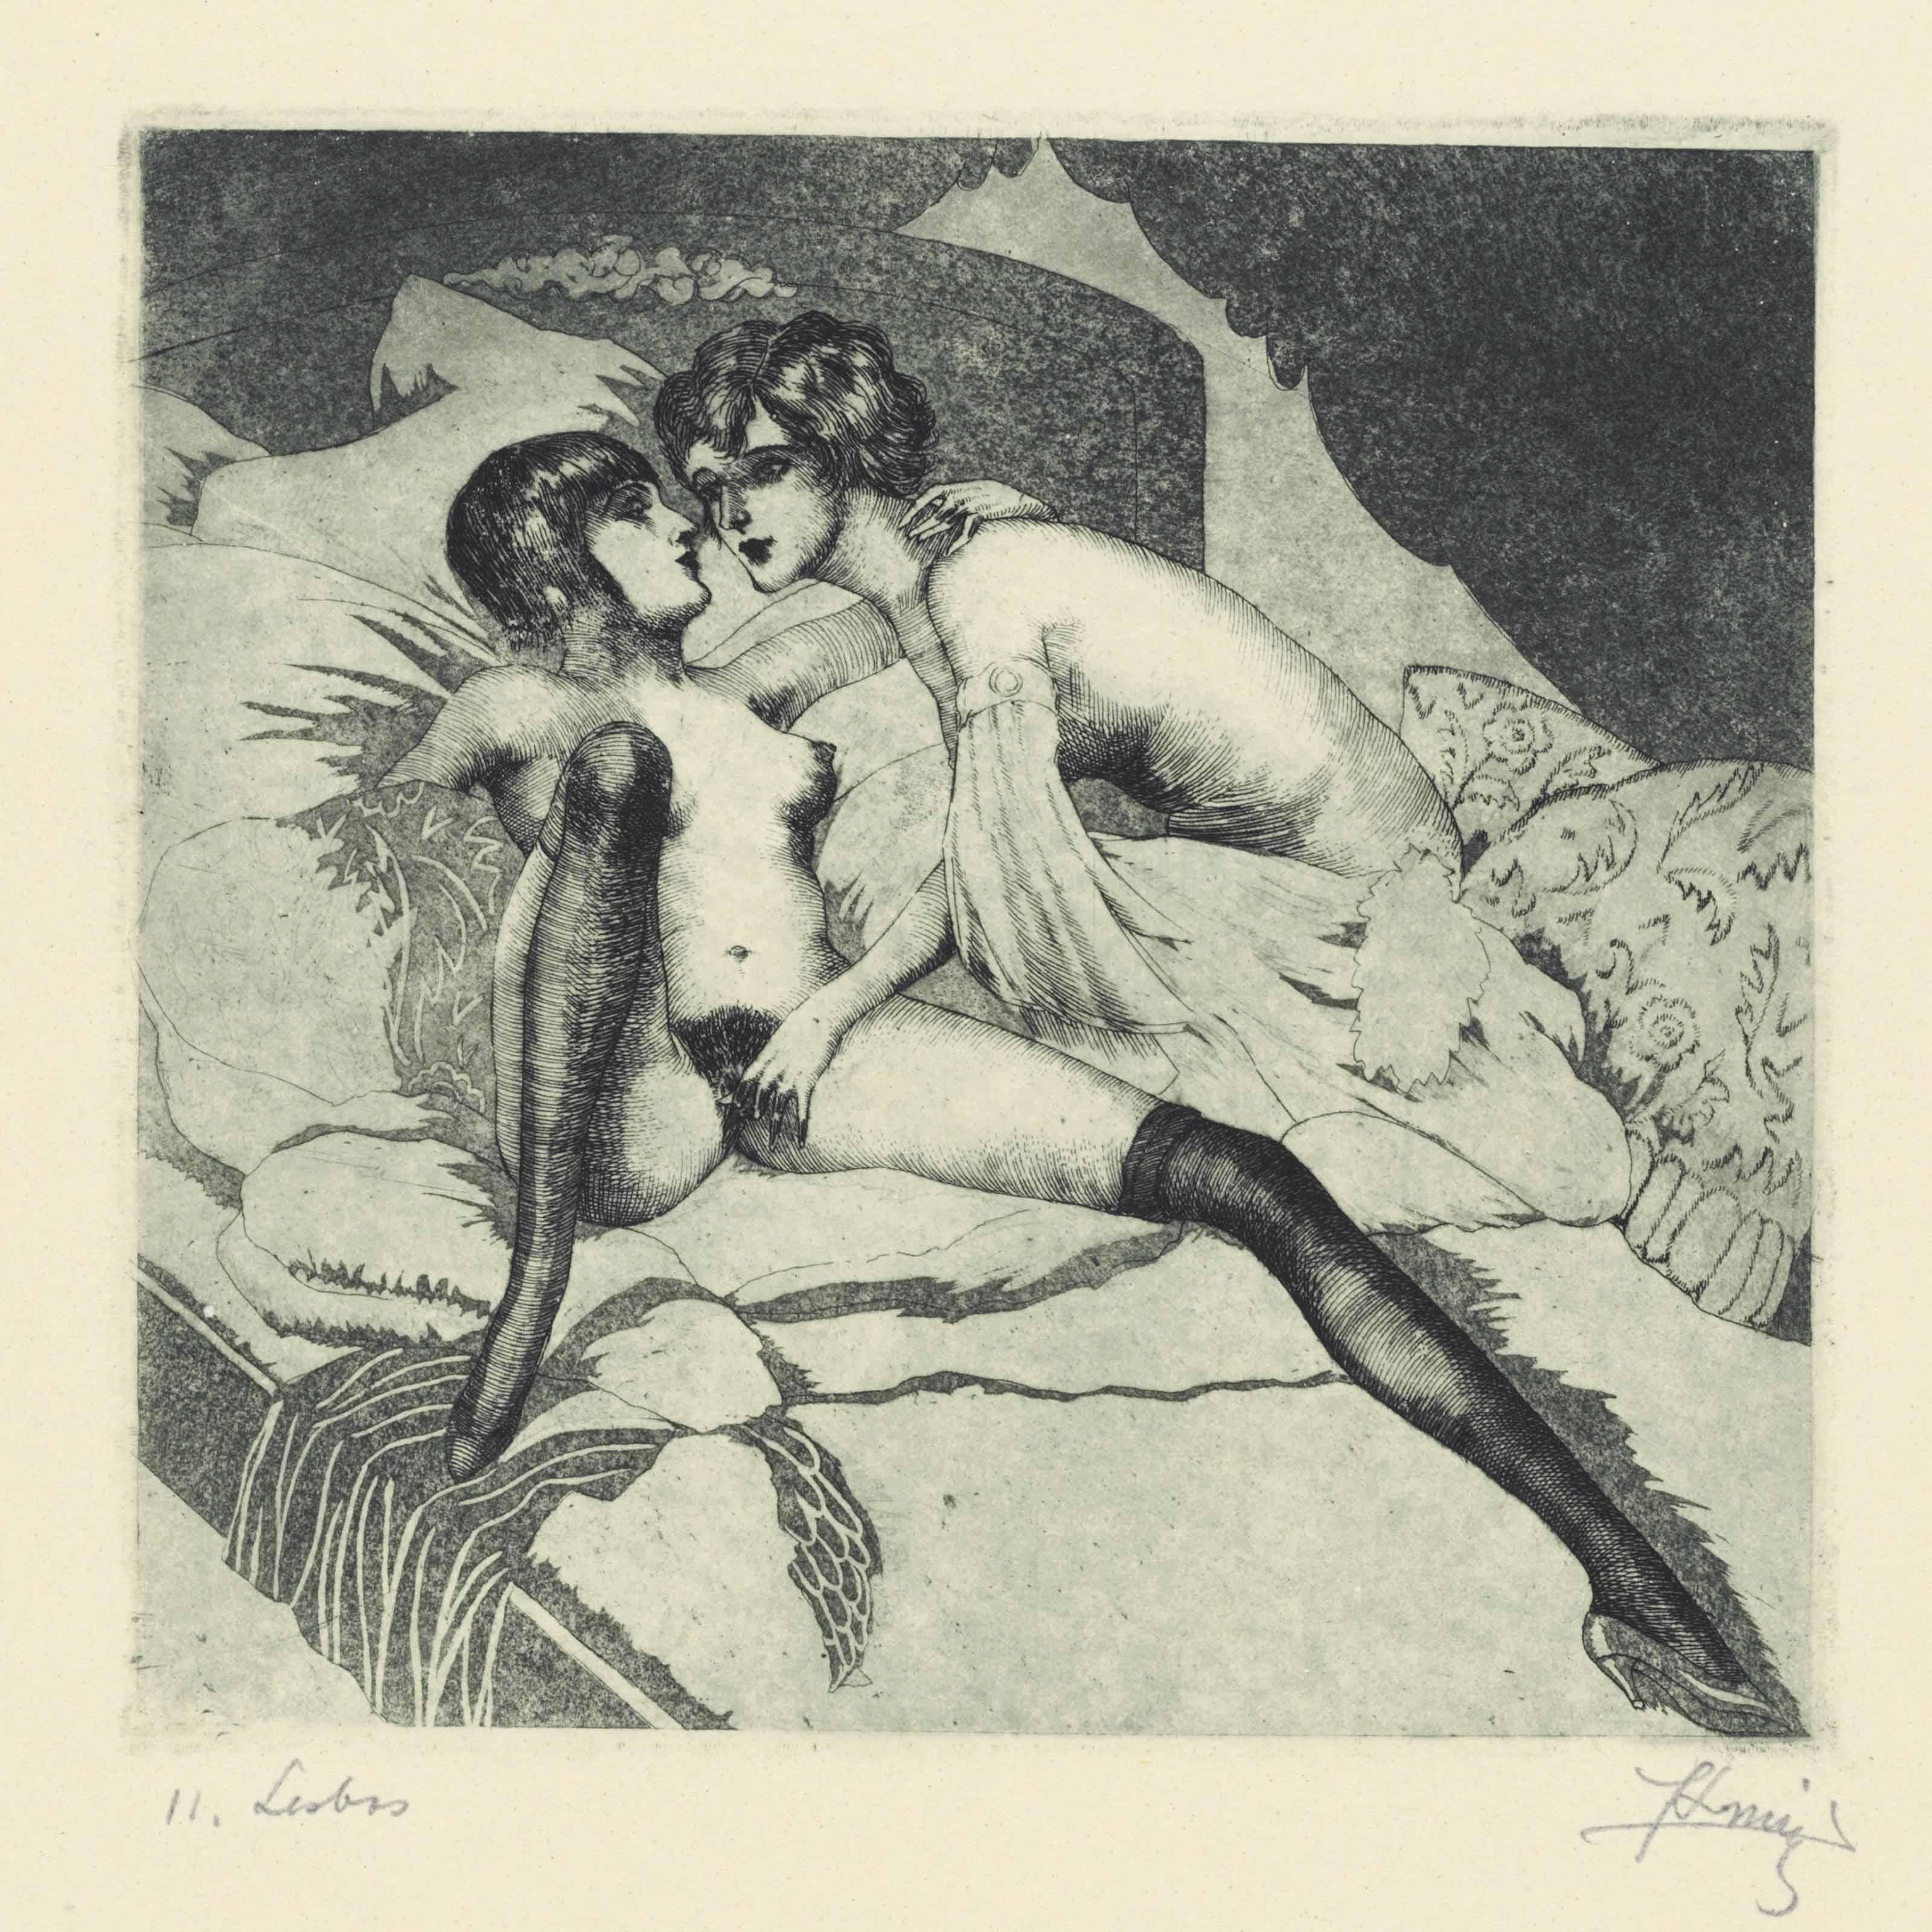 La 19eme femme hentai rpg 2013 - 3 8